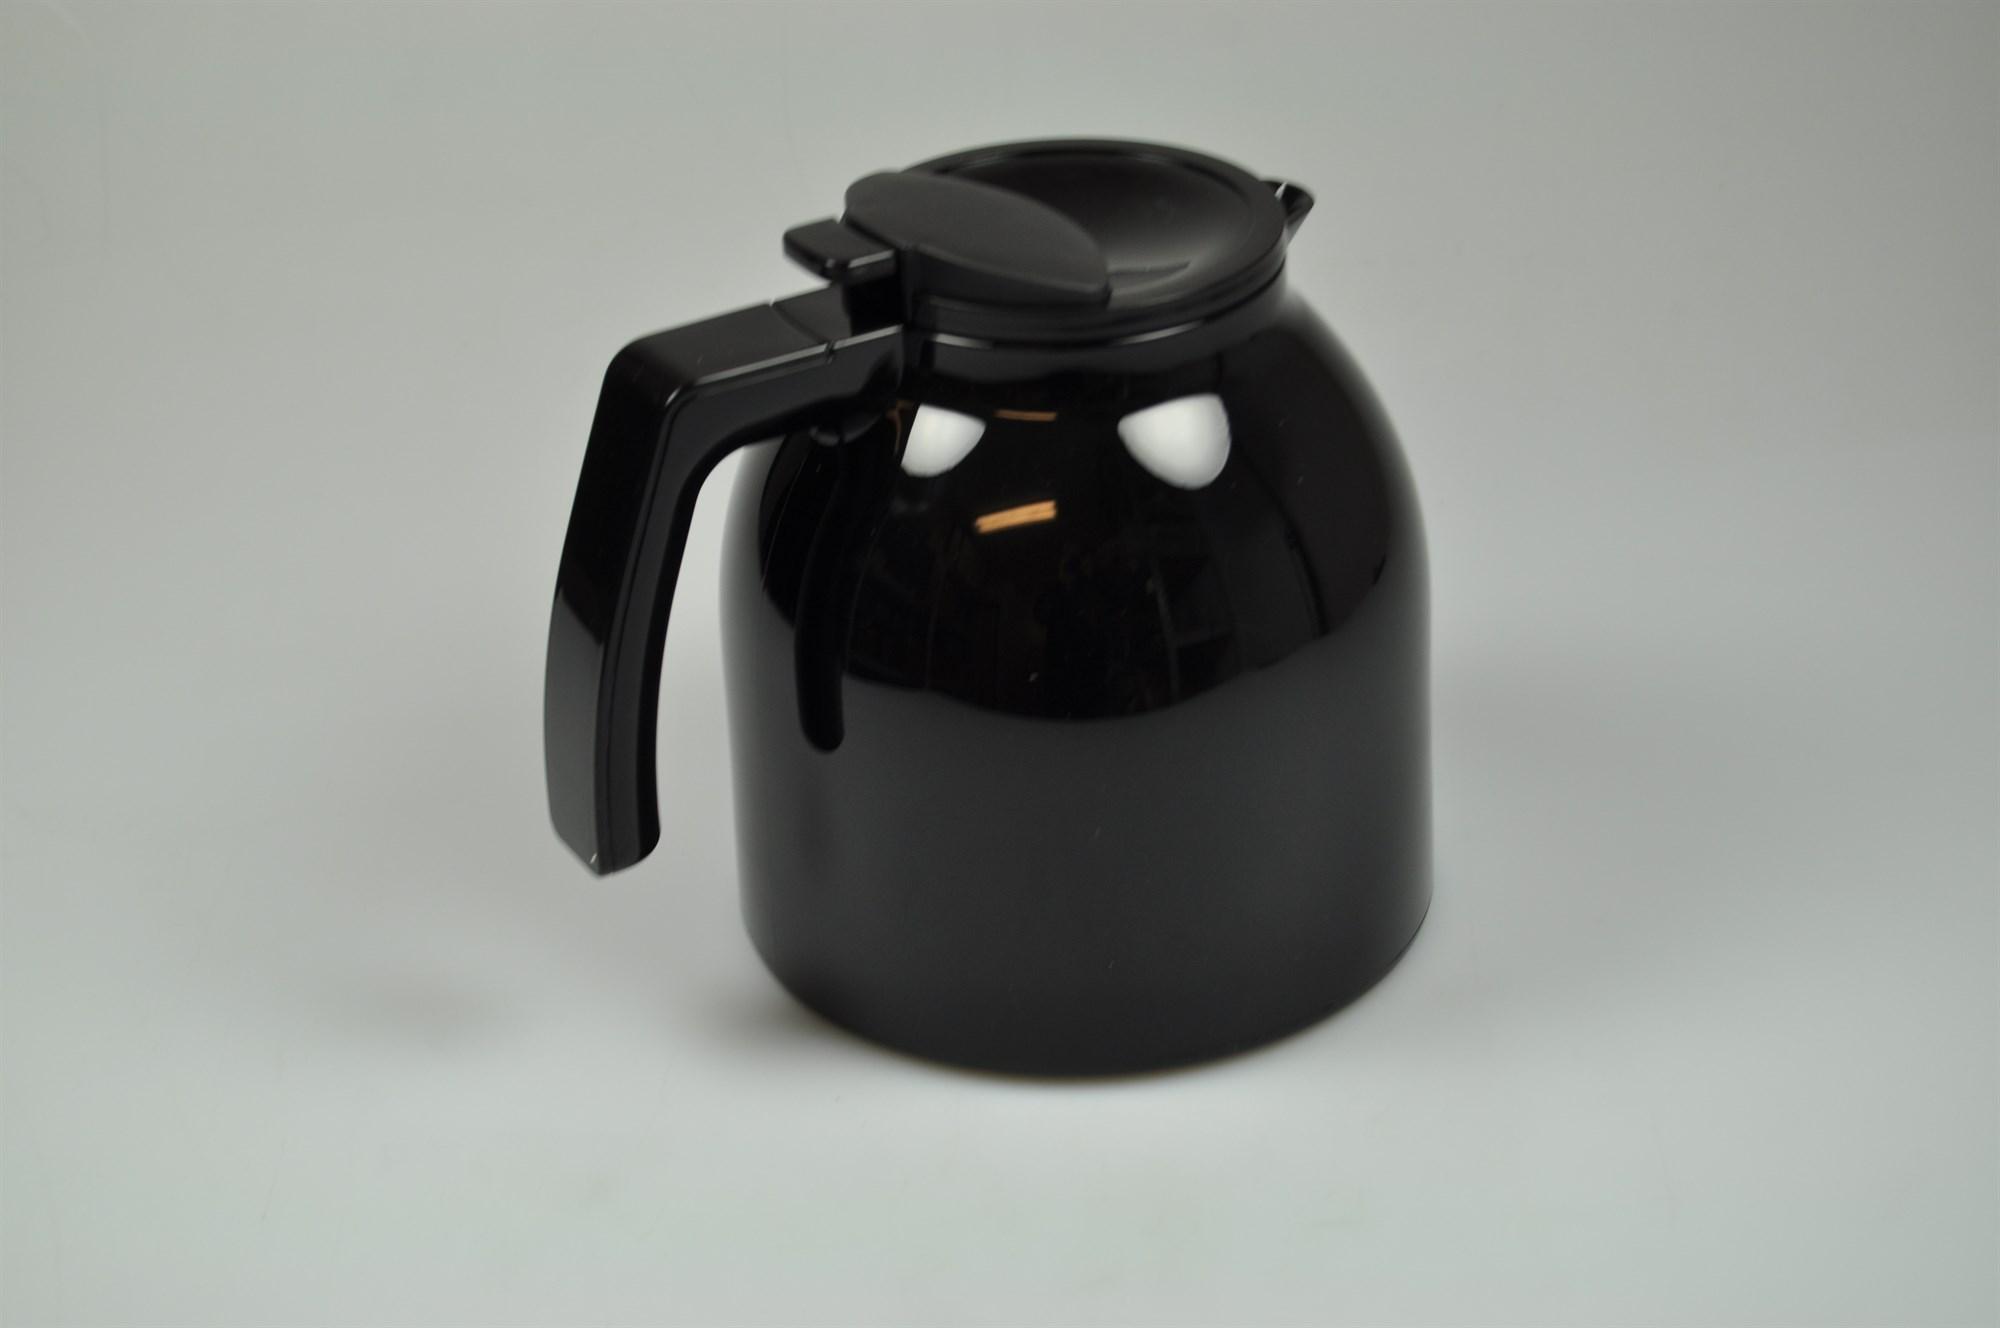 thermoskanne melitta kaffeemaschine 1250 ml. Black Bedroom Furniture Sets. Home Design Ideas